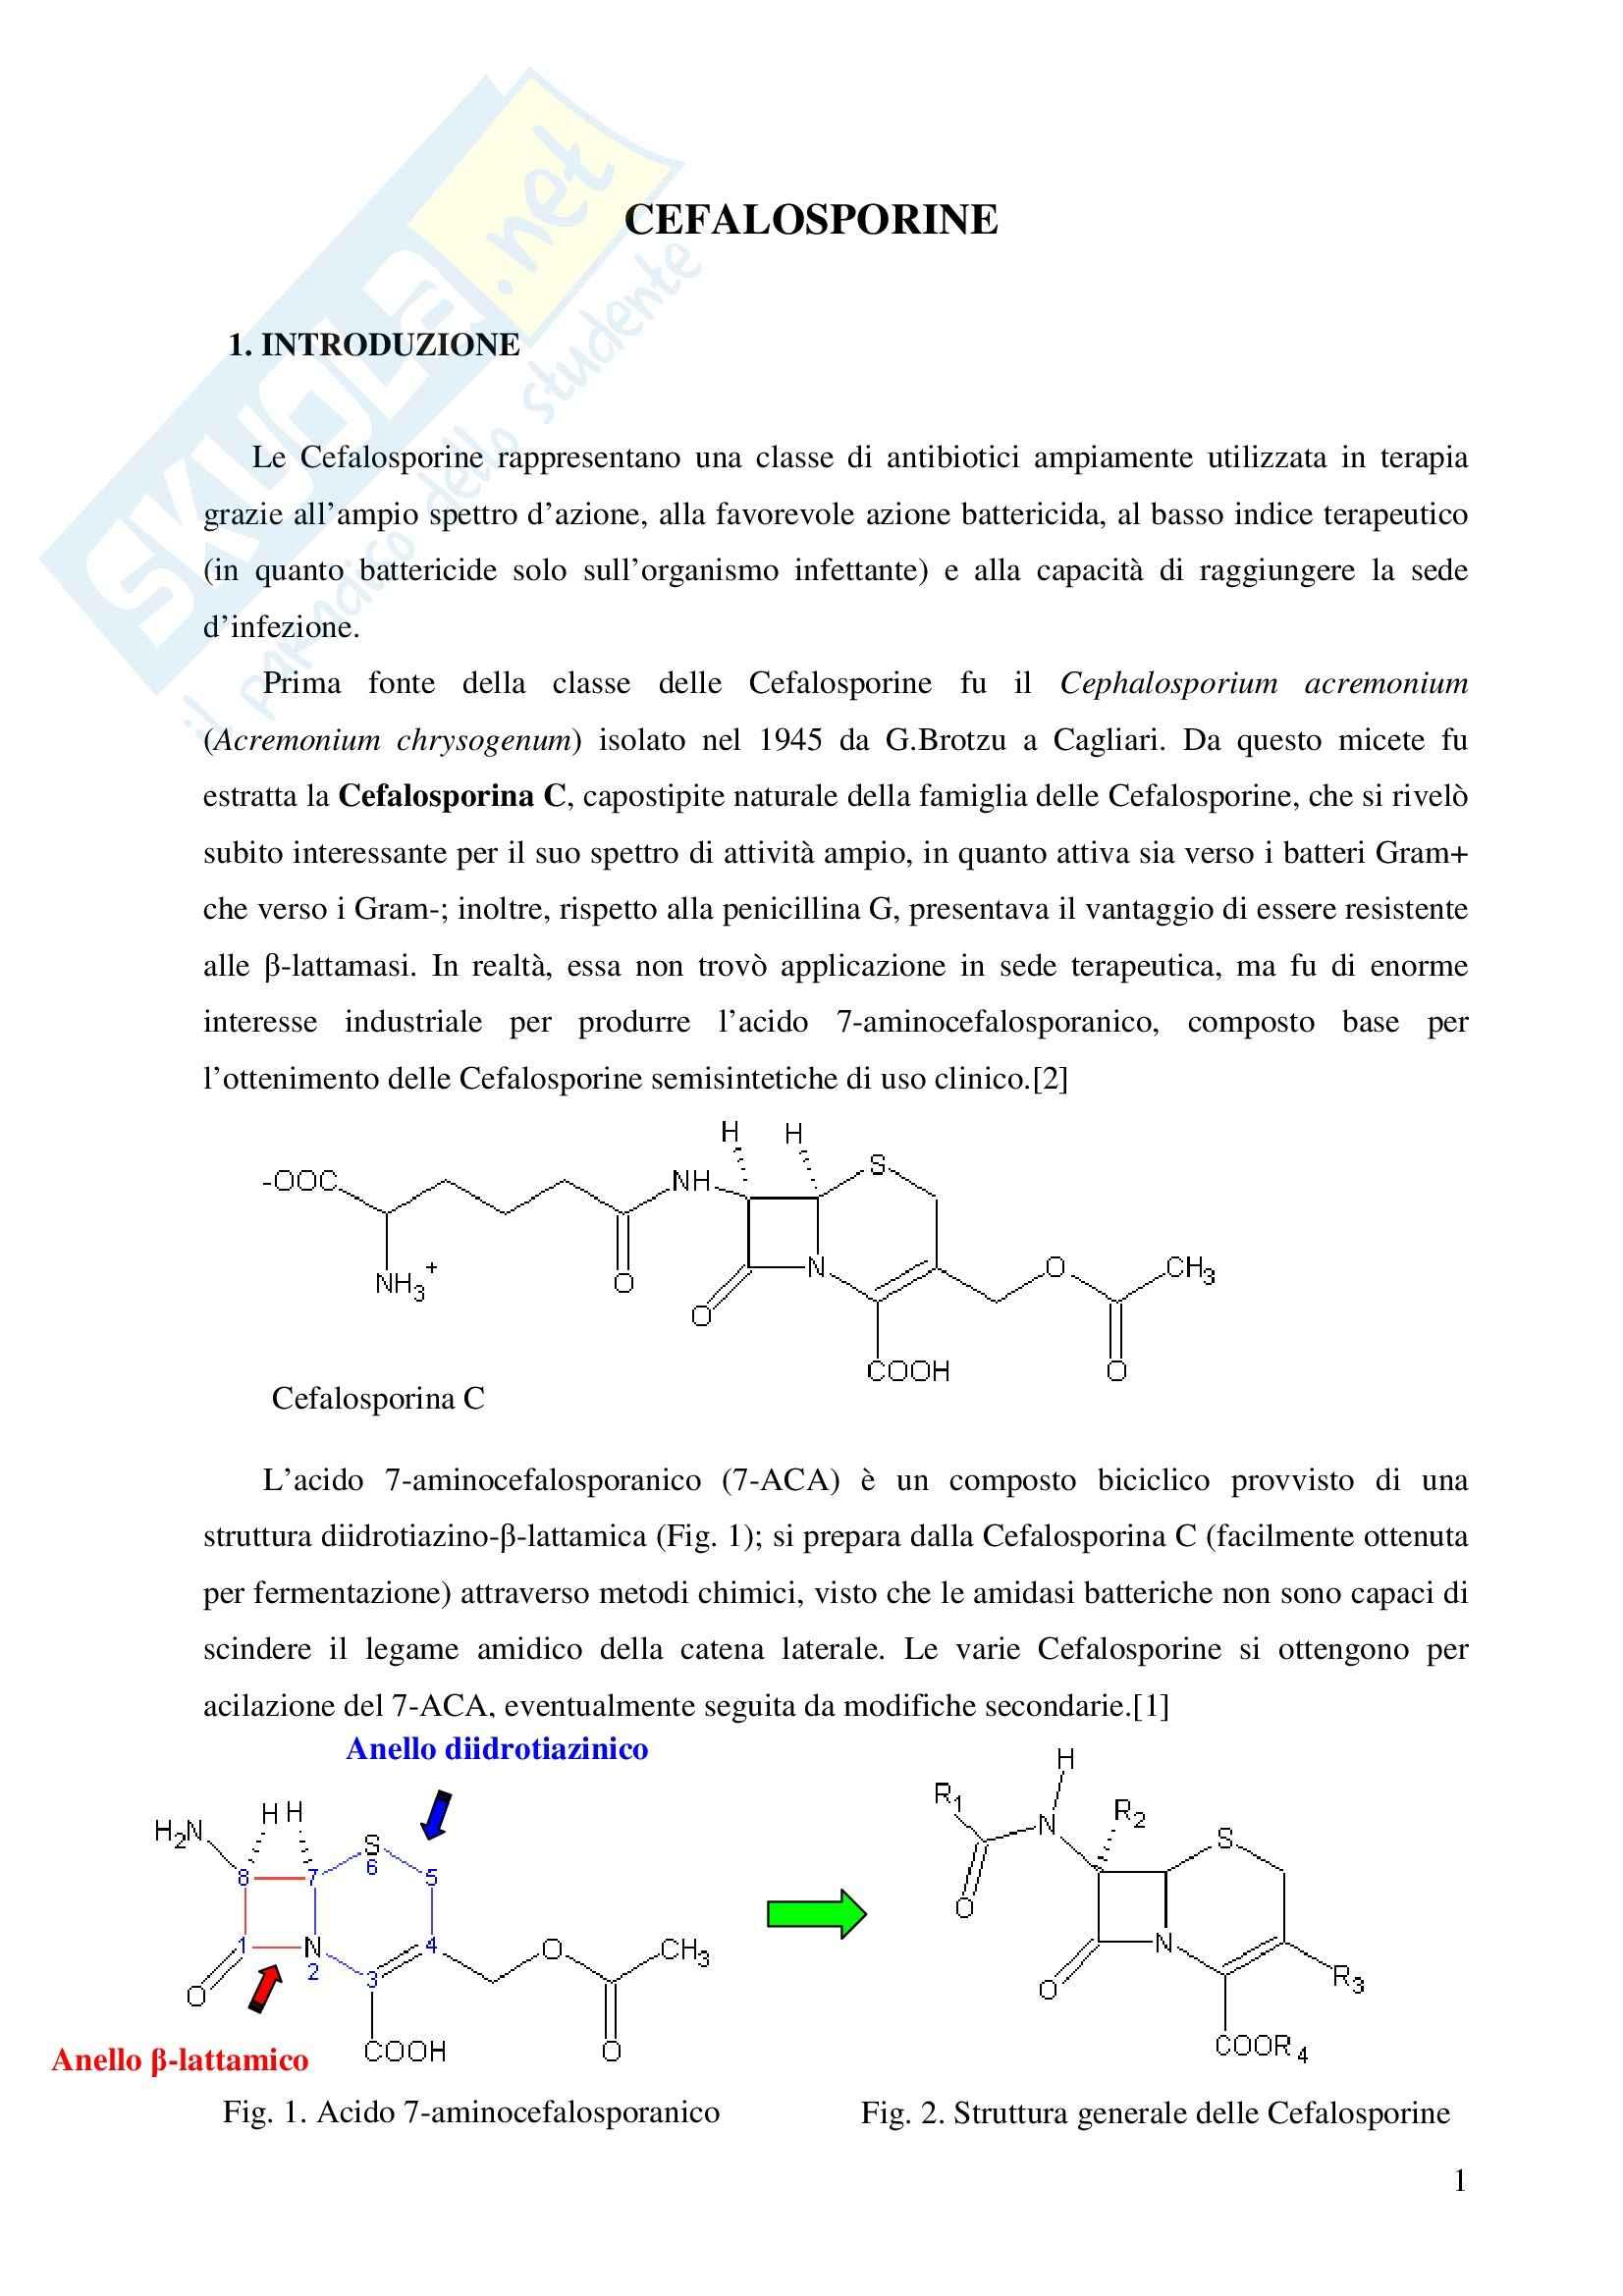 Chimica farmaceutica - le cefalosporine